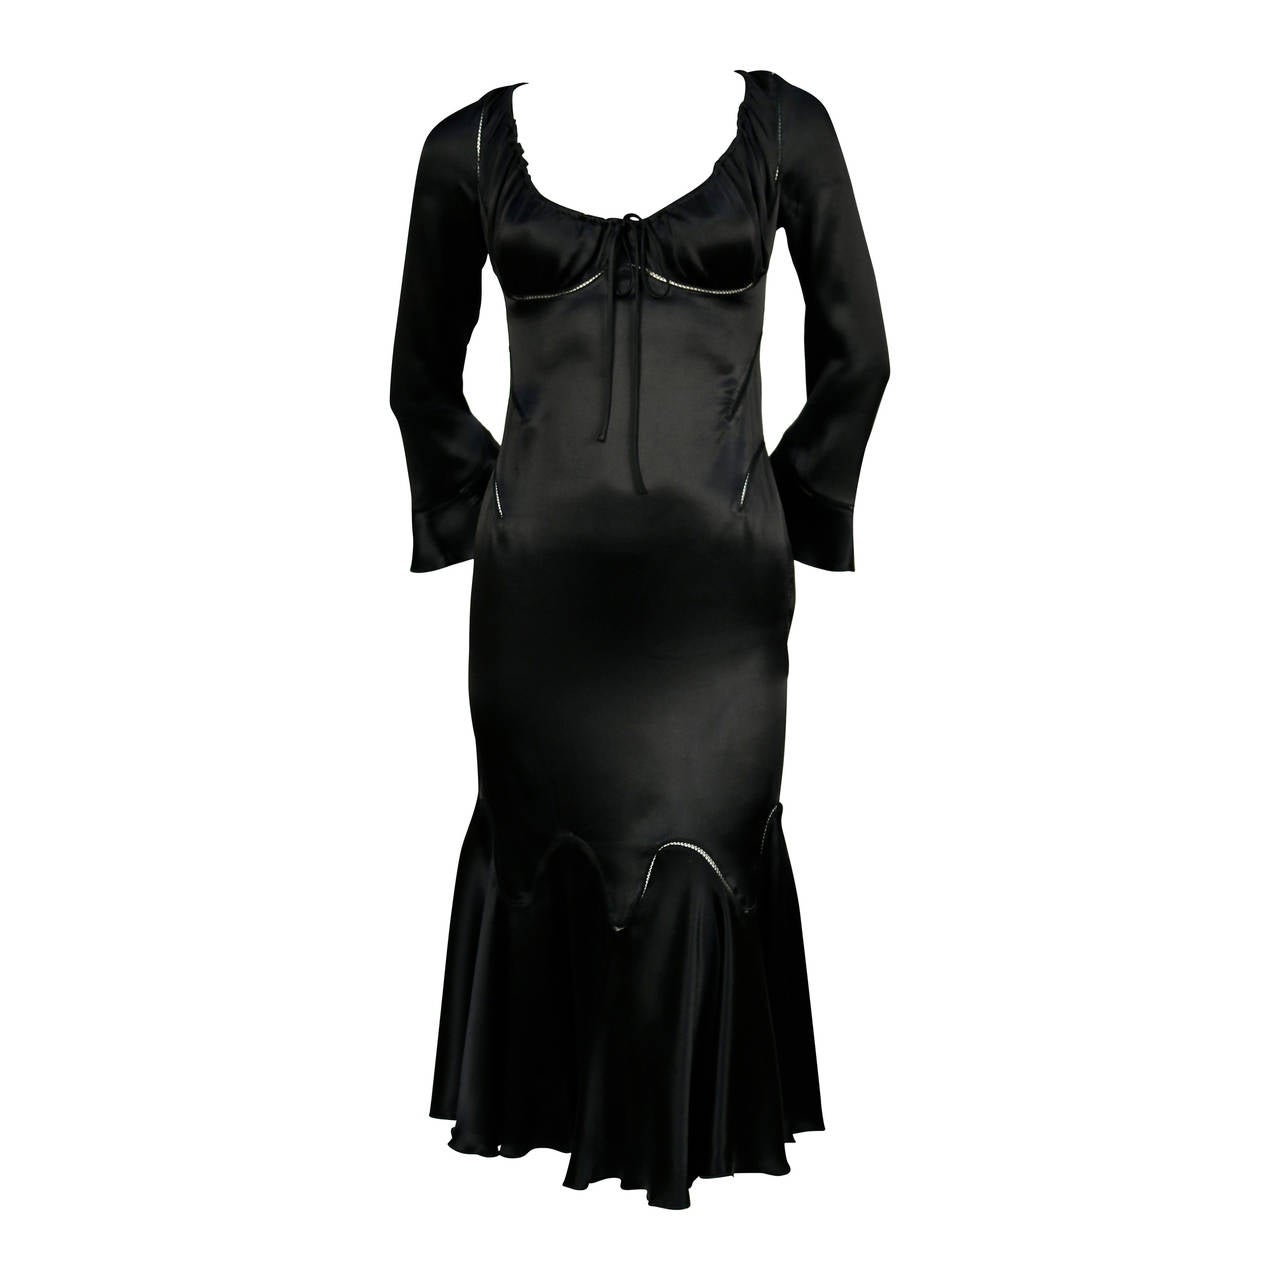 Alexander McQueen black silk charmeuse dress, 2002   For Sale